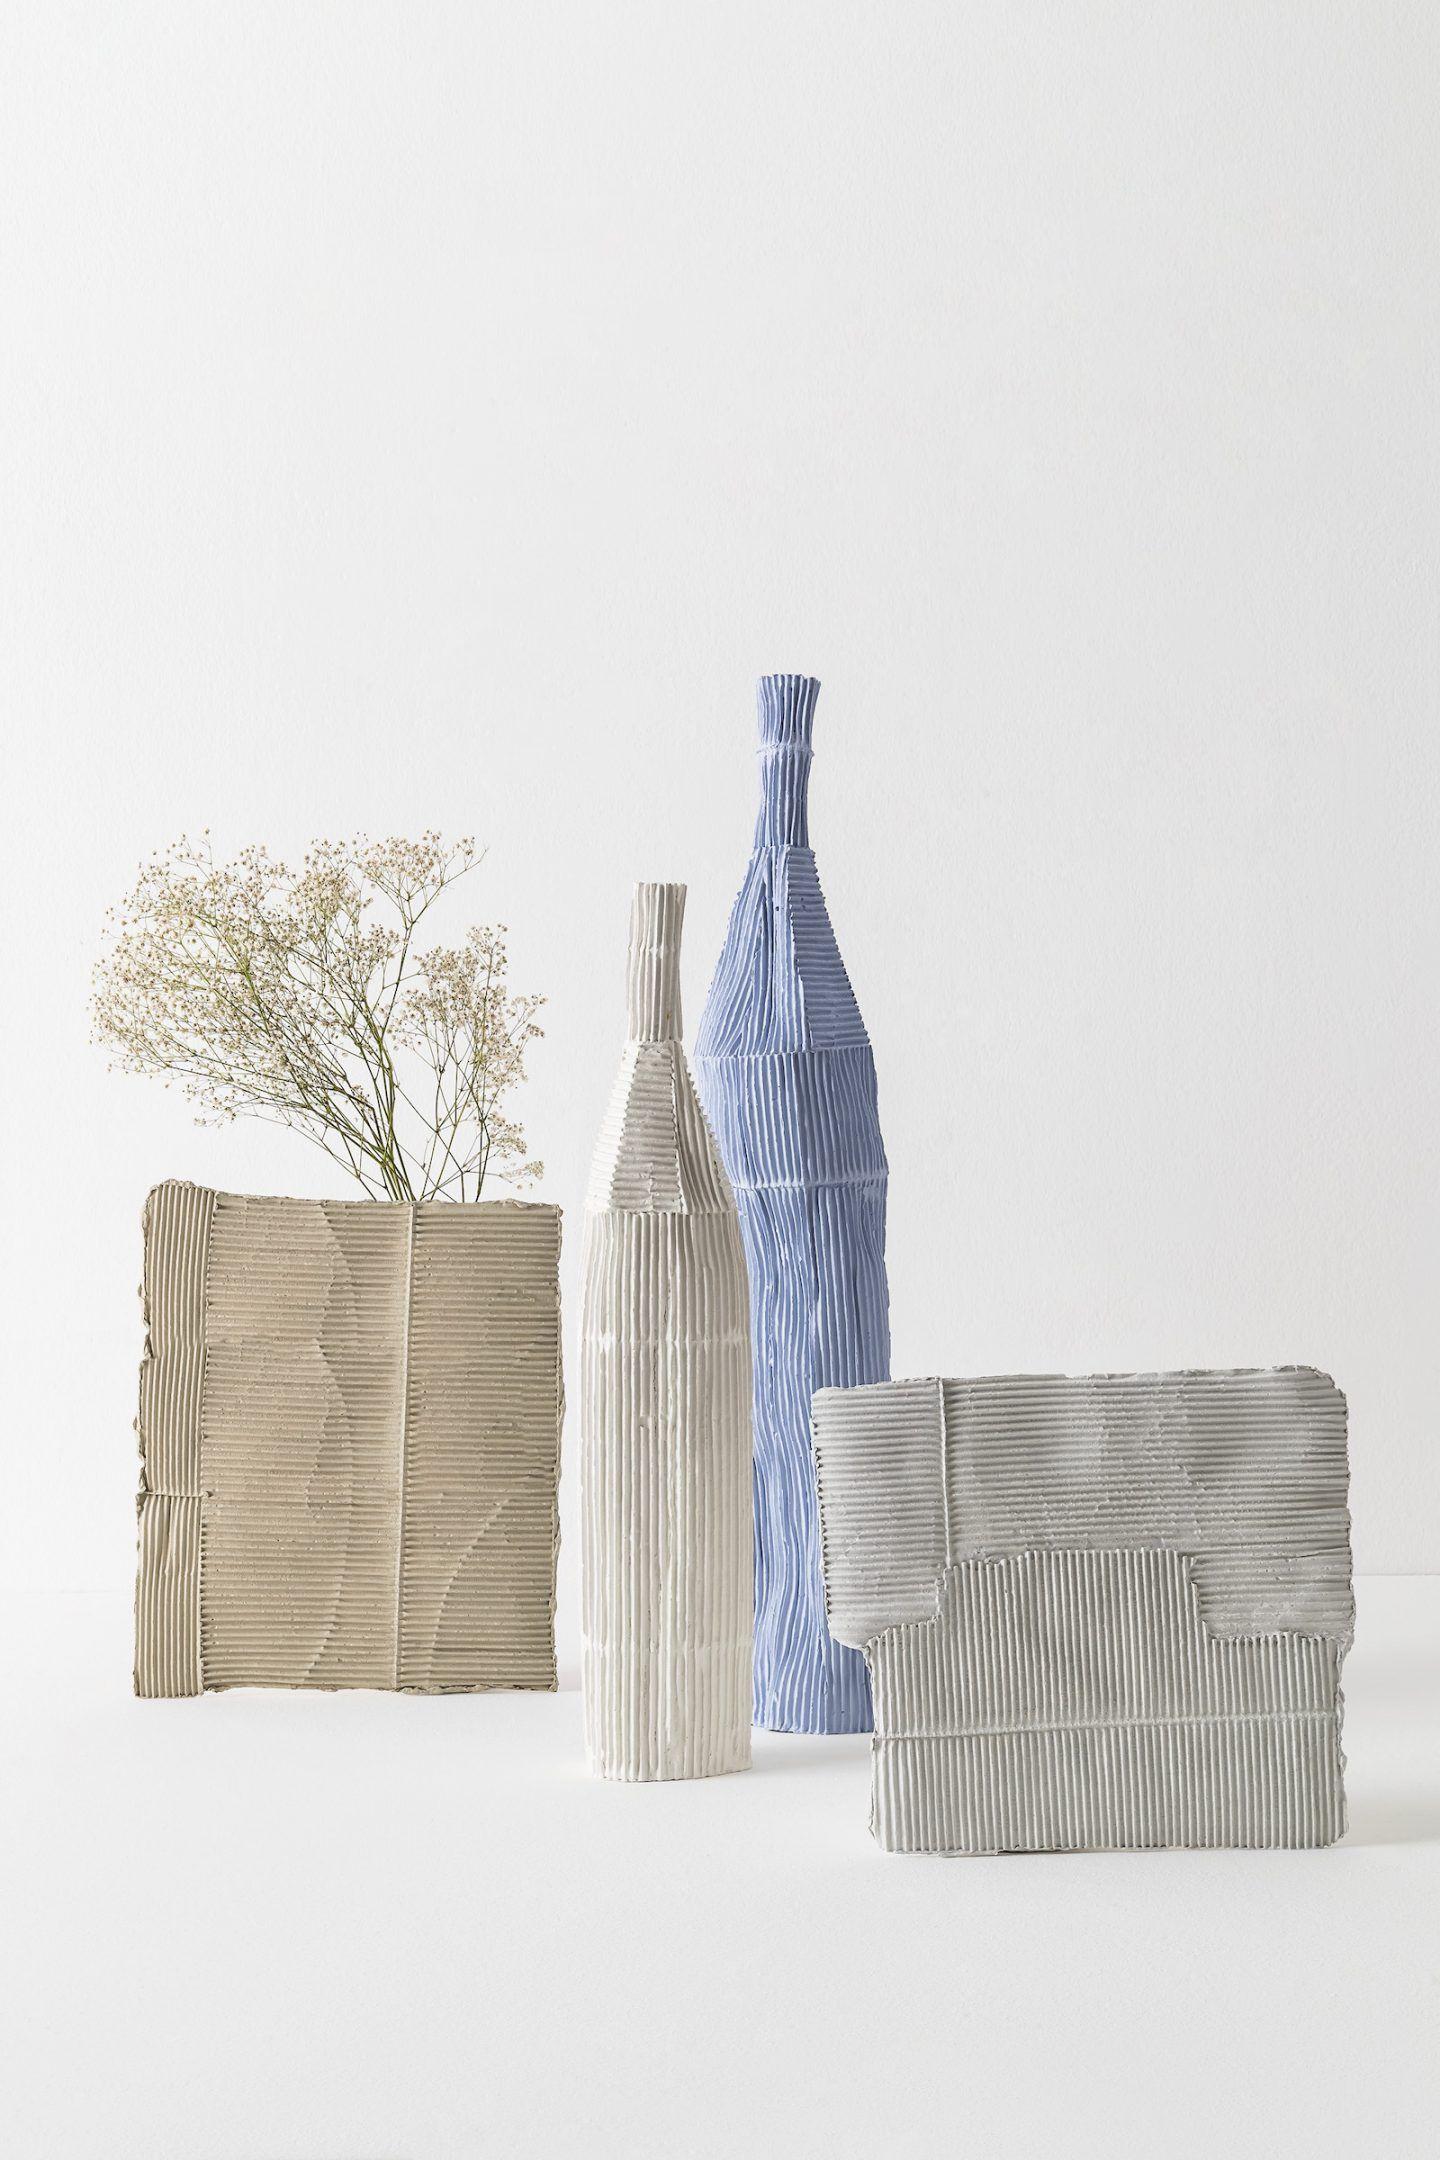 IGNANT-Design-Paola-Paronetto-015